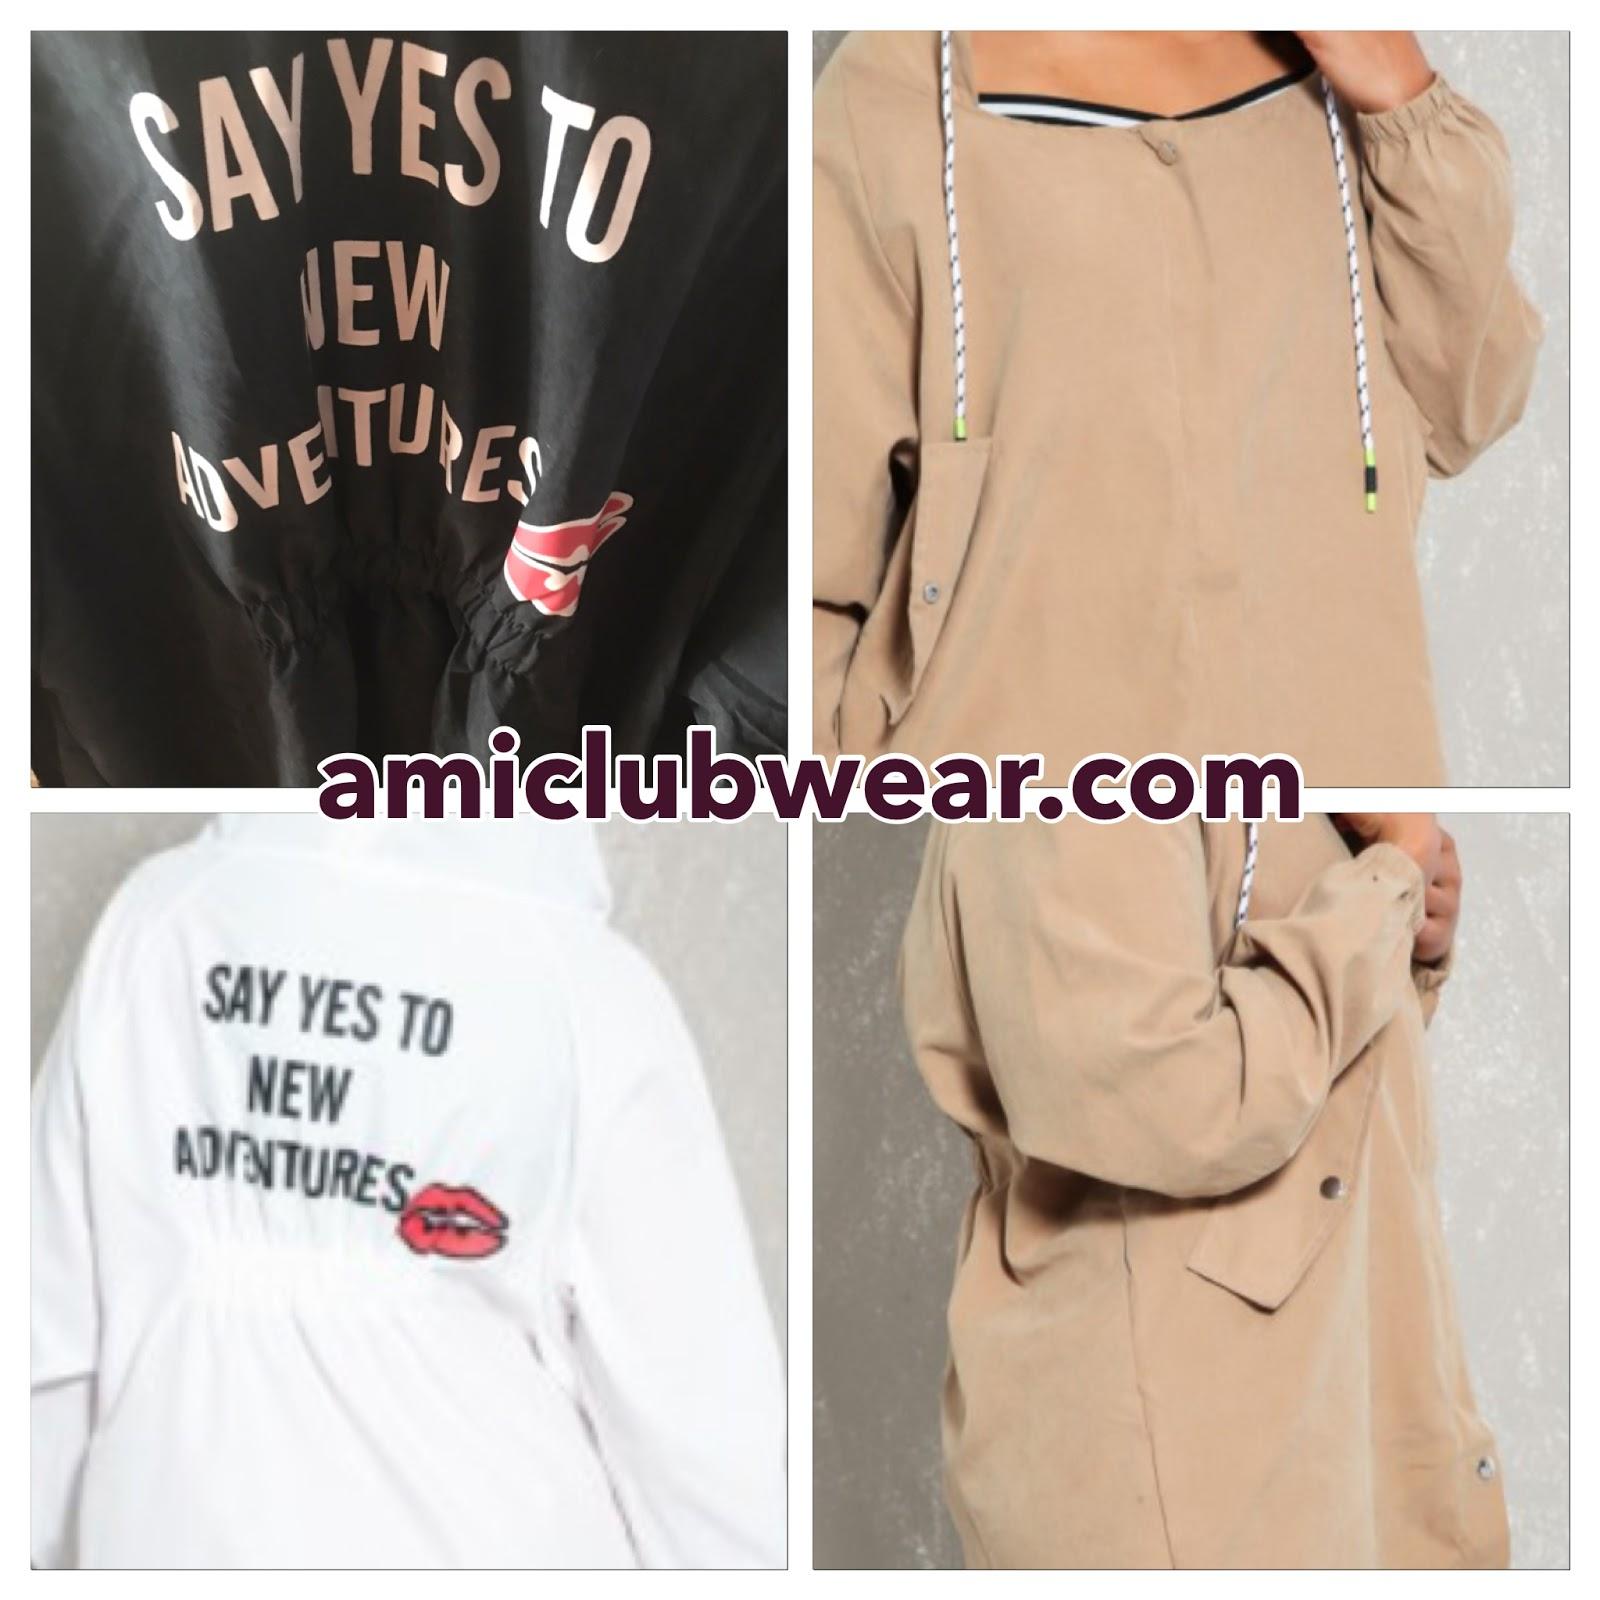 2c7bb915086 Razzle Dazzle Styles  Reviews! GiveAways! Promo! Fashion Blogger ...